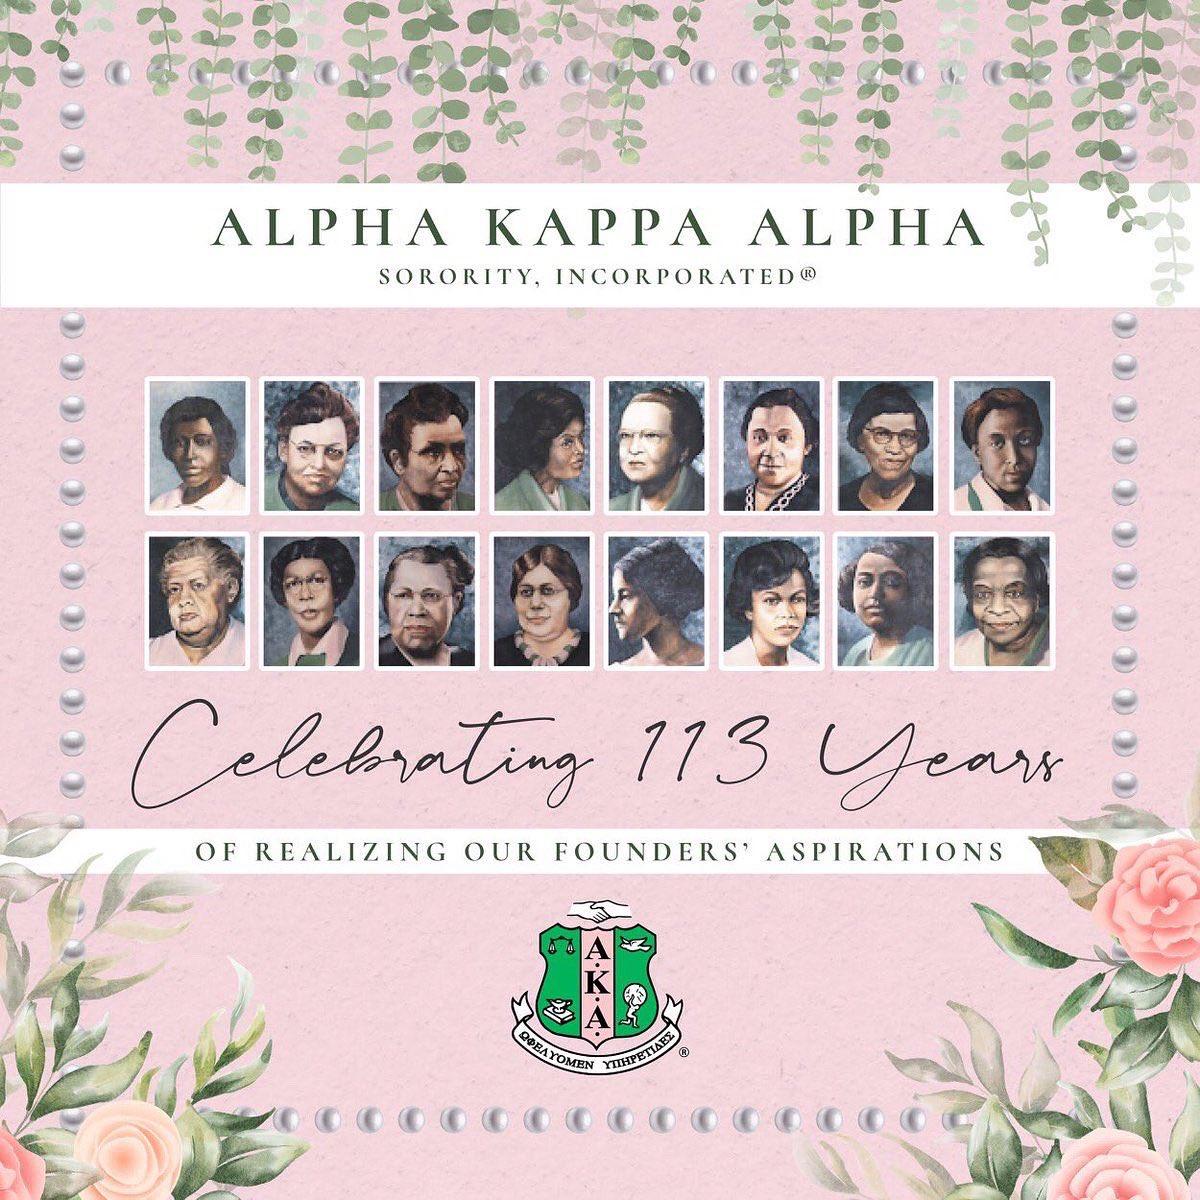 Happy Founders Day Sorors! 113 Years of Service 💗💚 #J15 #AKA1908